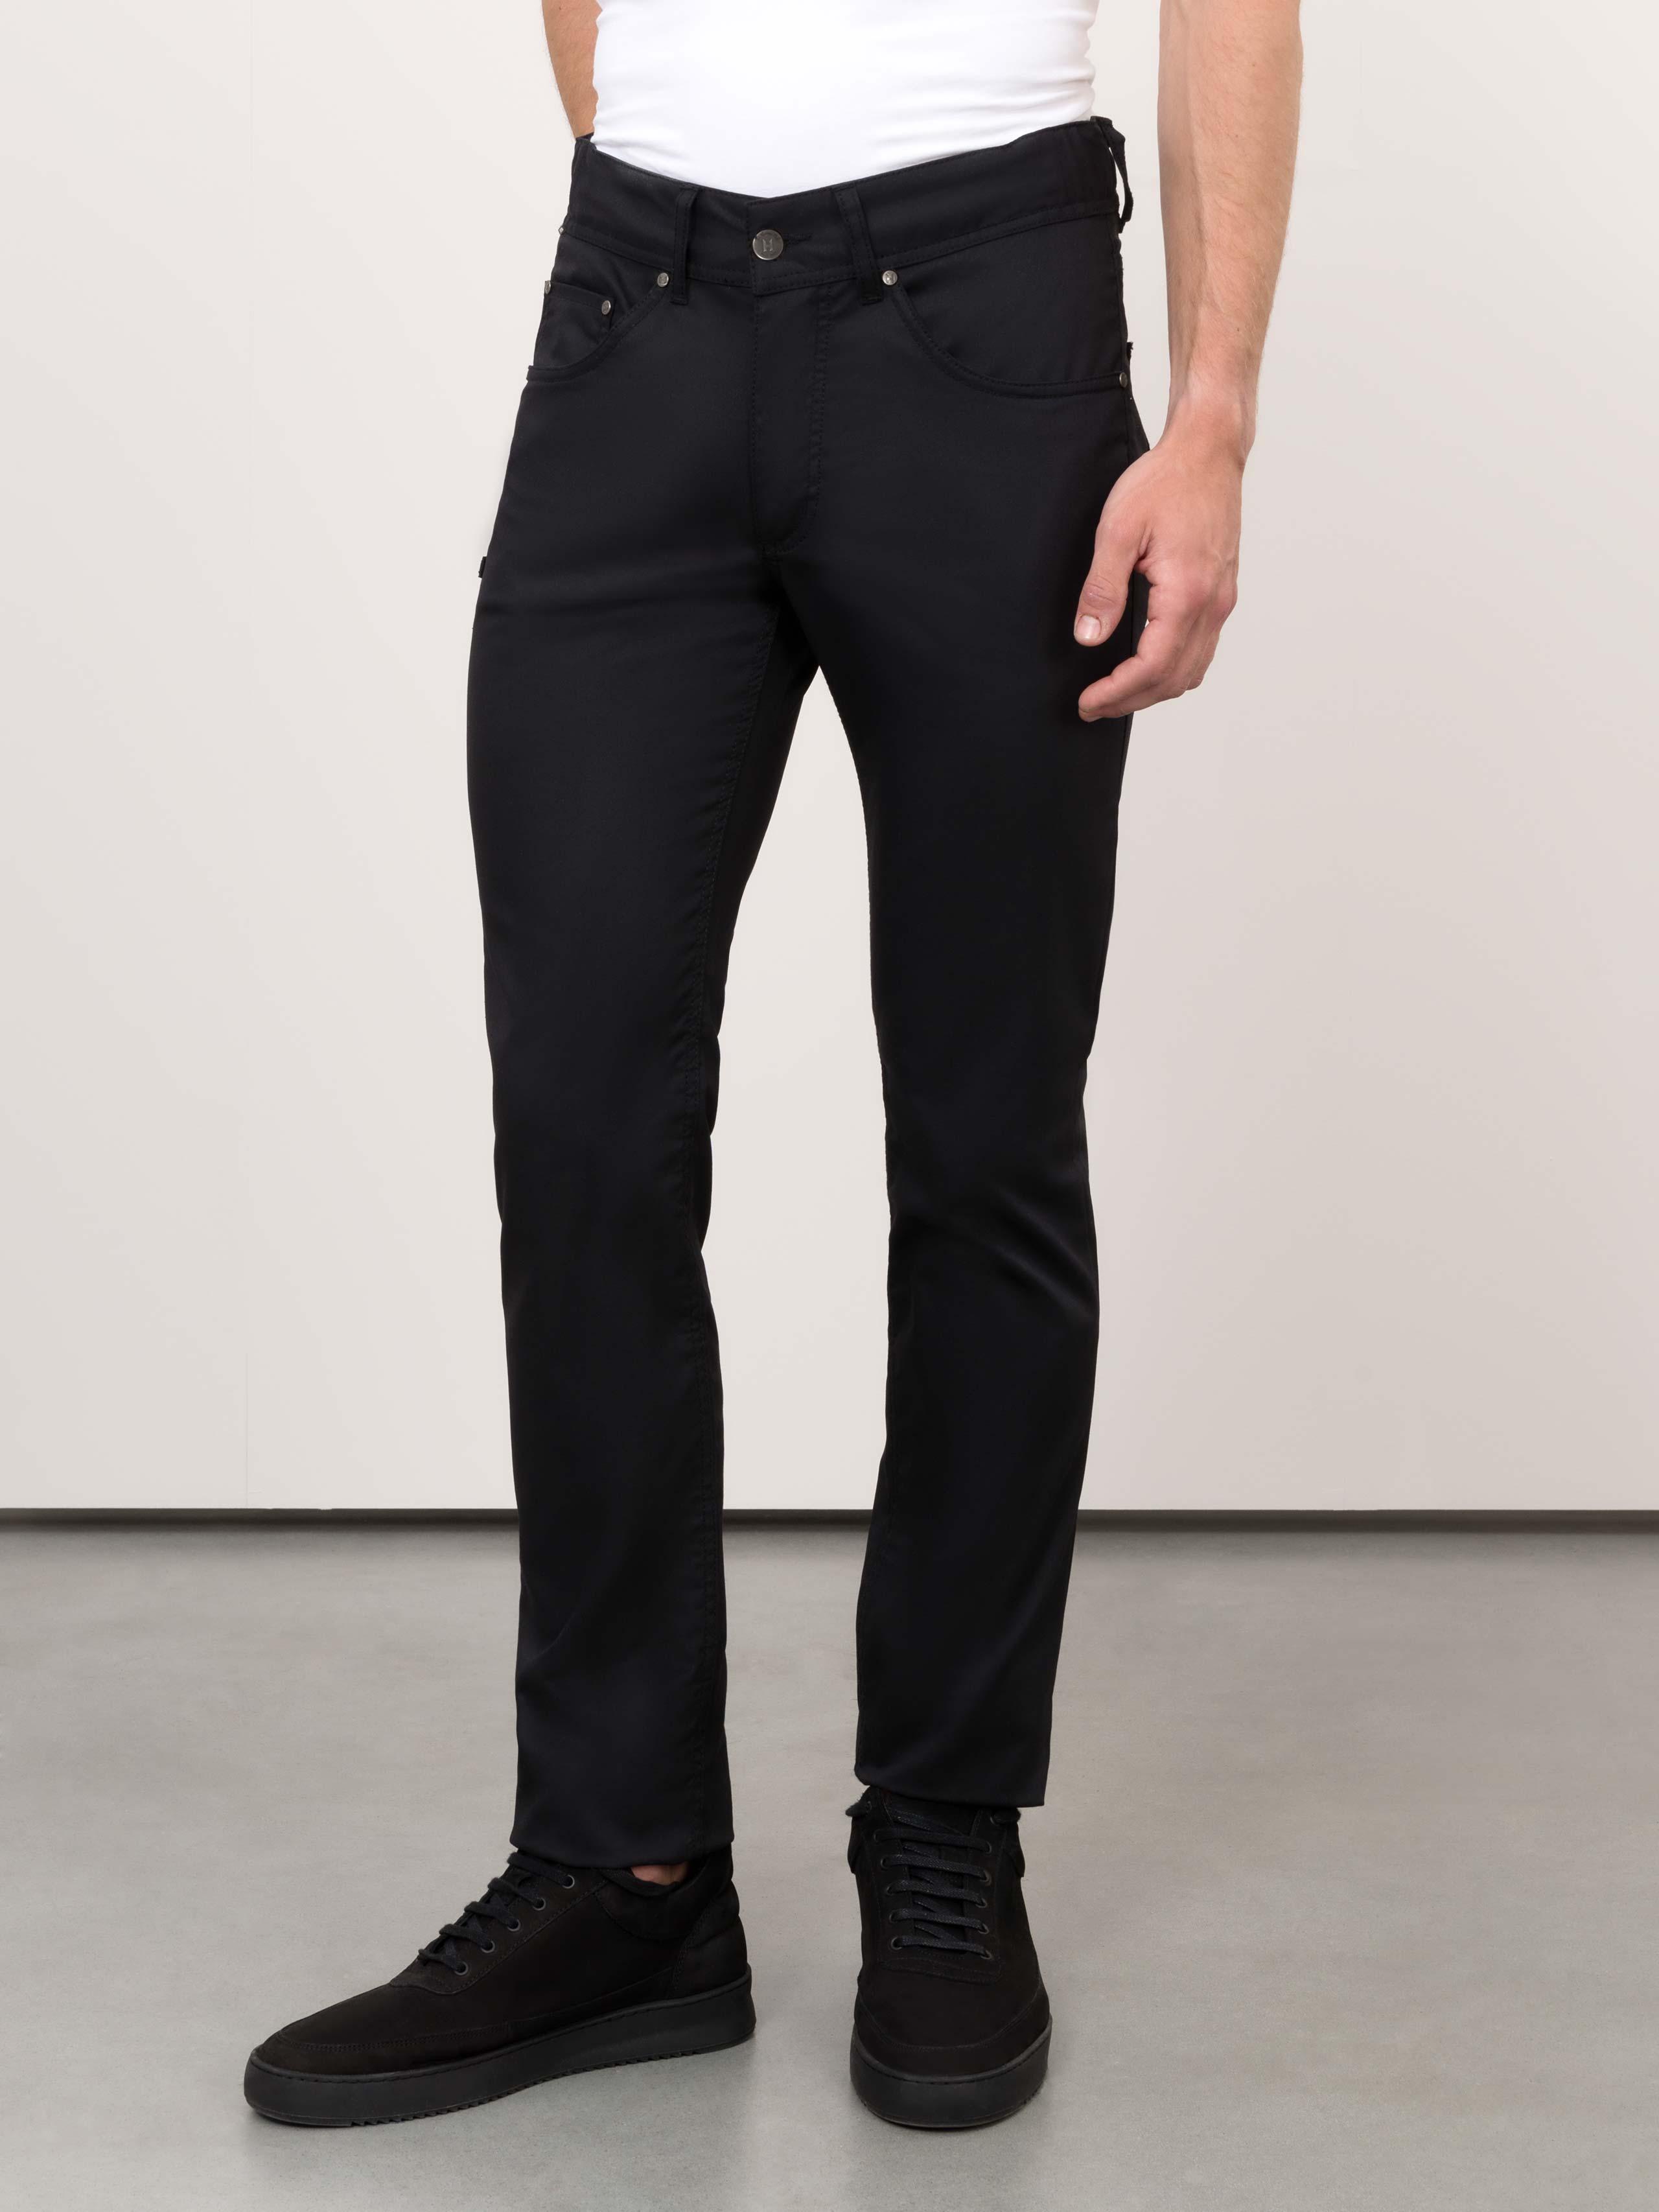 Pants Oregon Black